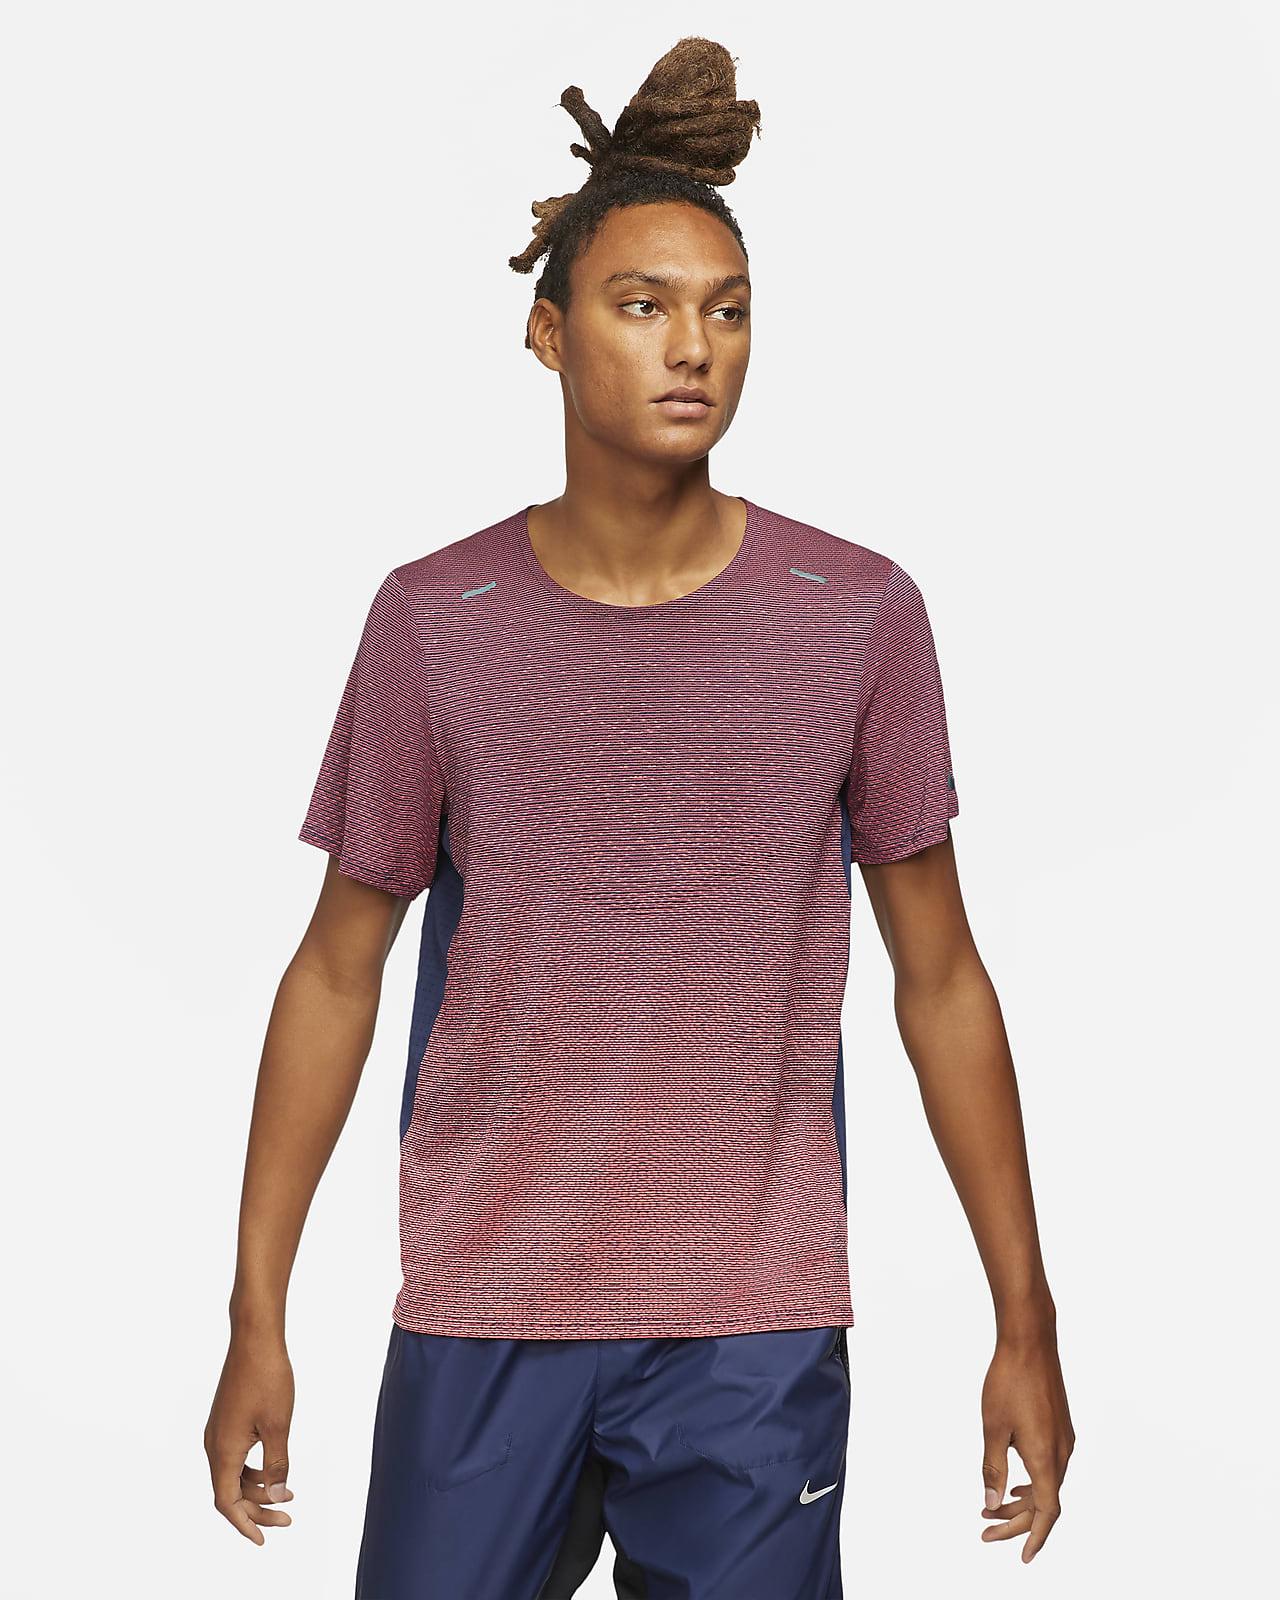 Nike Pinnacle Run Division Samarreta de màniga curta de running - Home